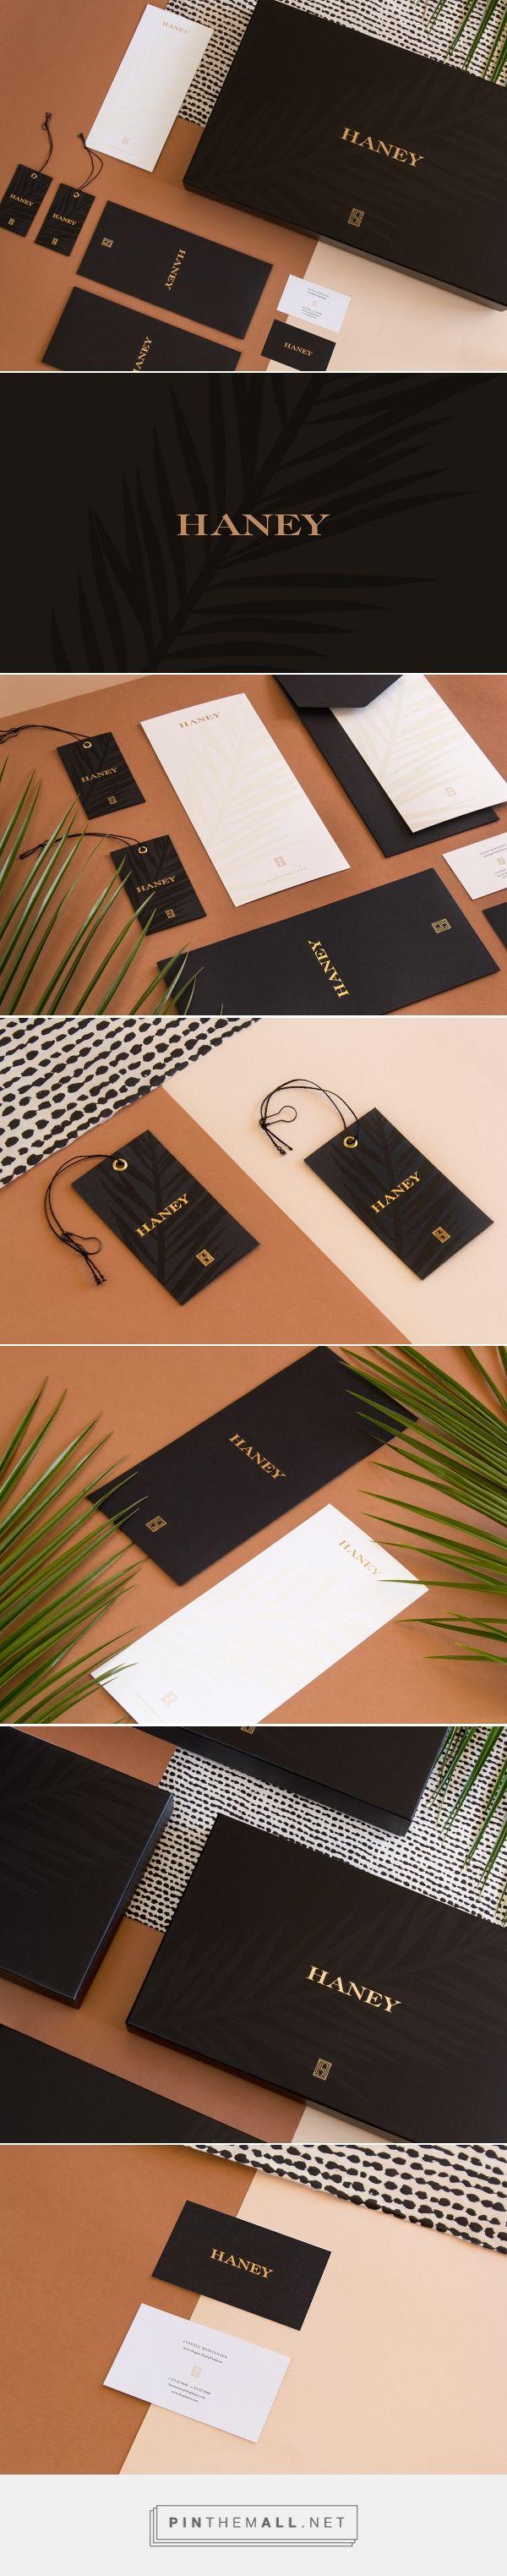 Haney Branding by Kati Forner The 678